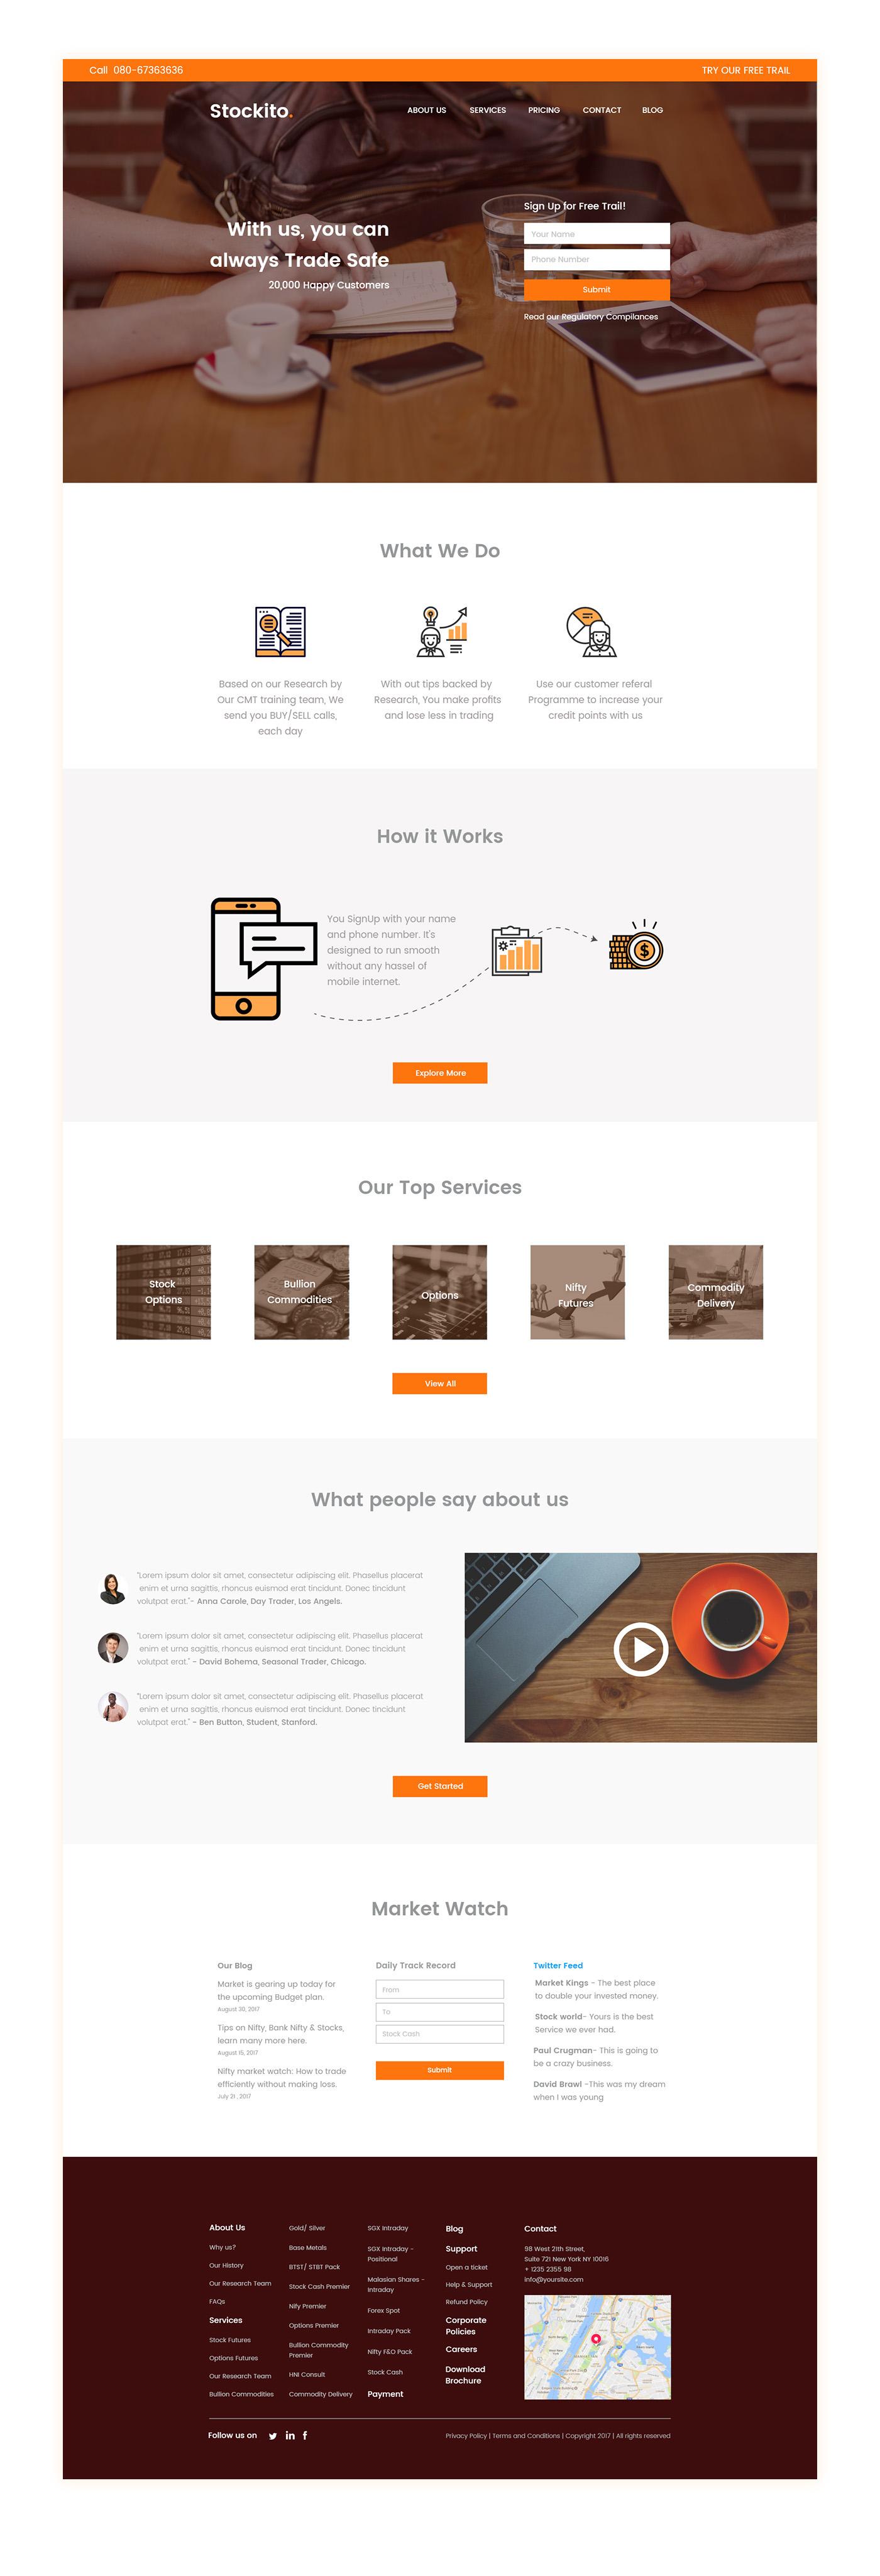 trading freebie India Hyderabad orange Web Design  Adobe Experience Design